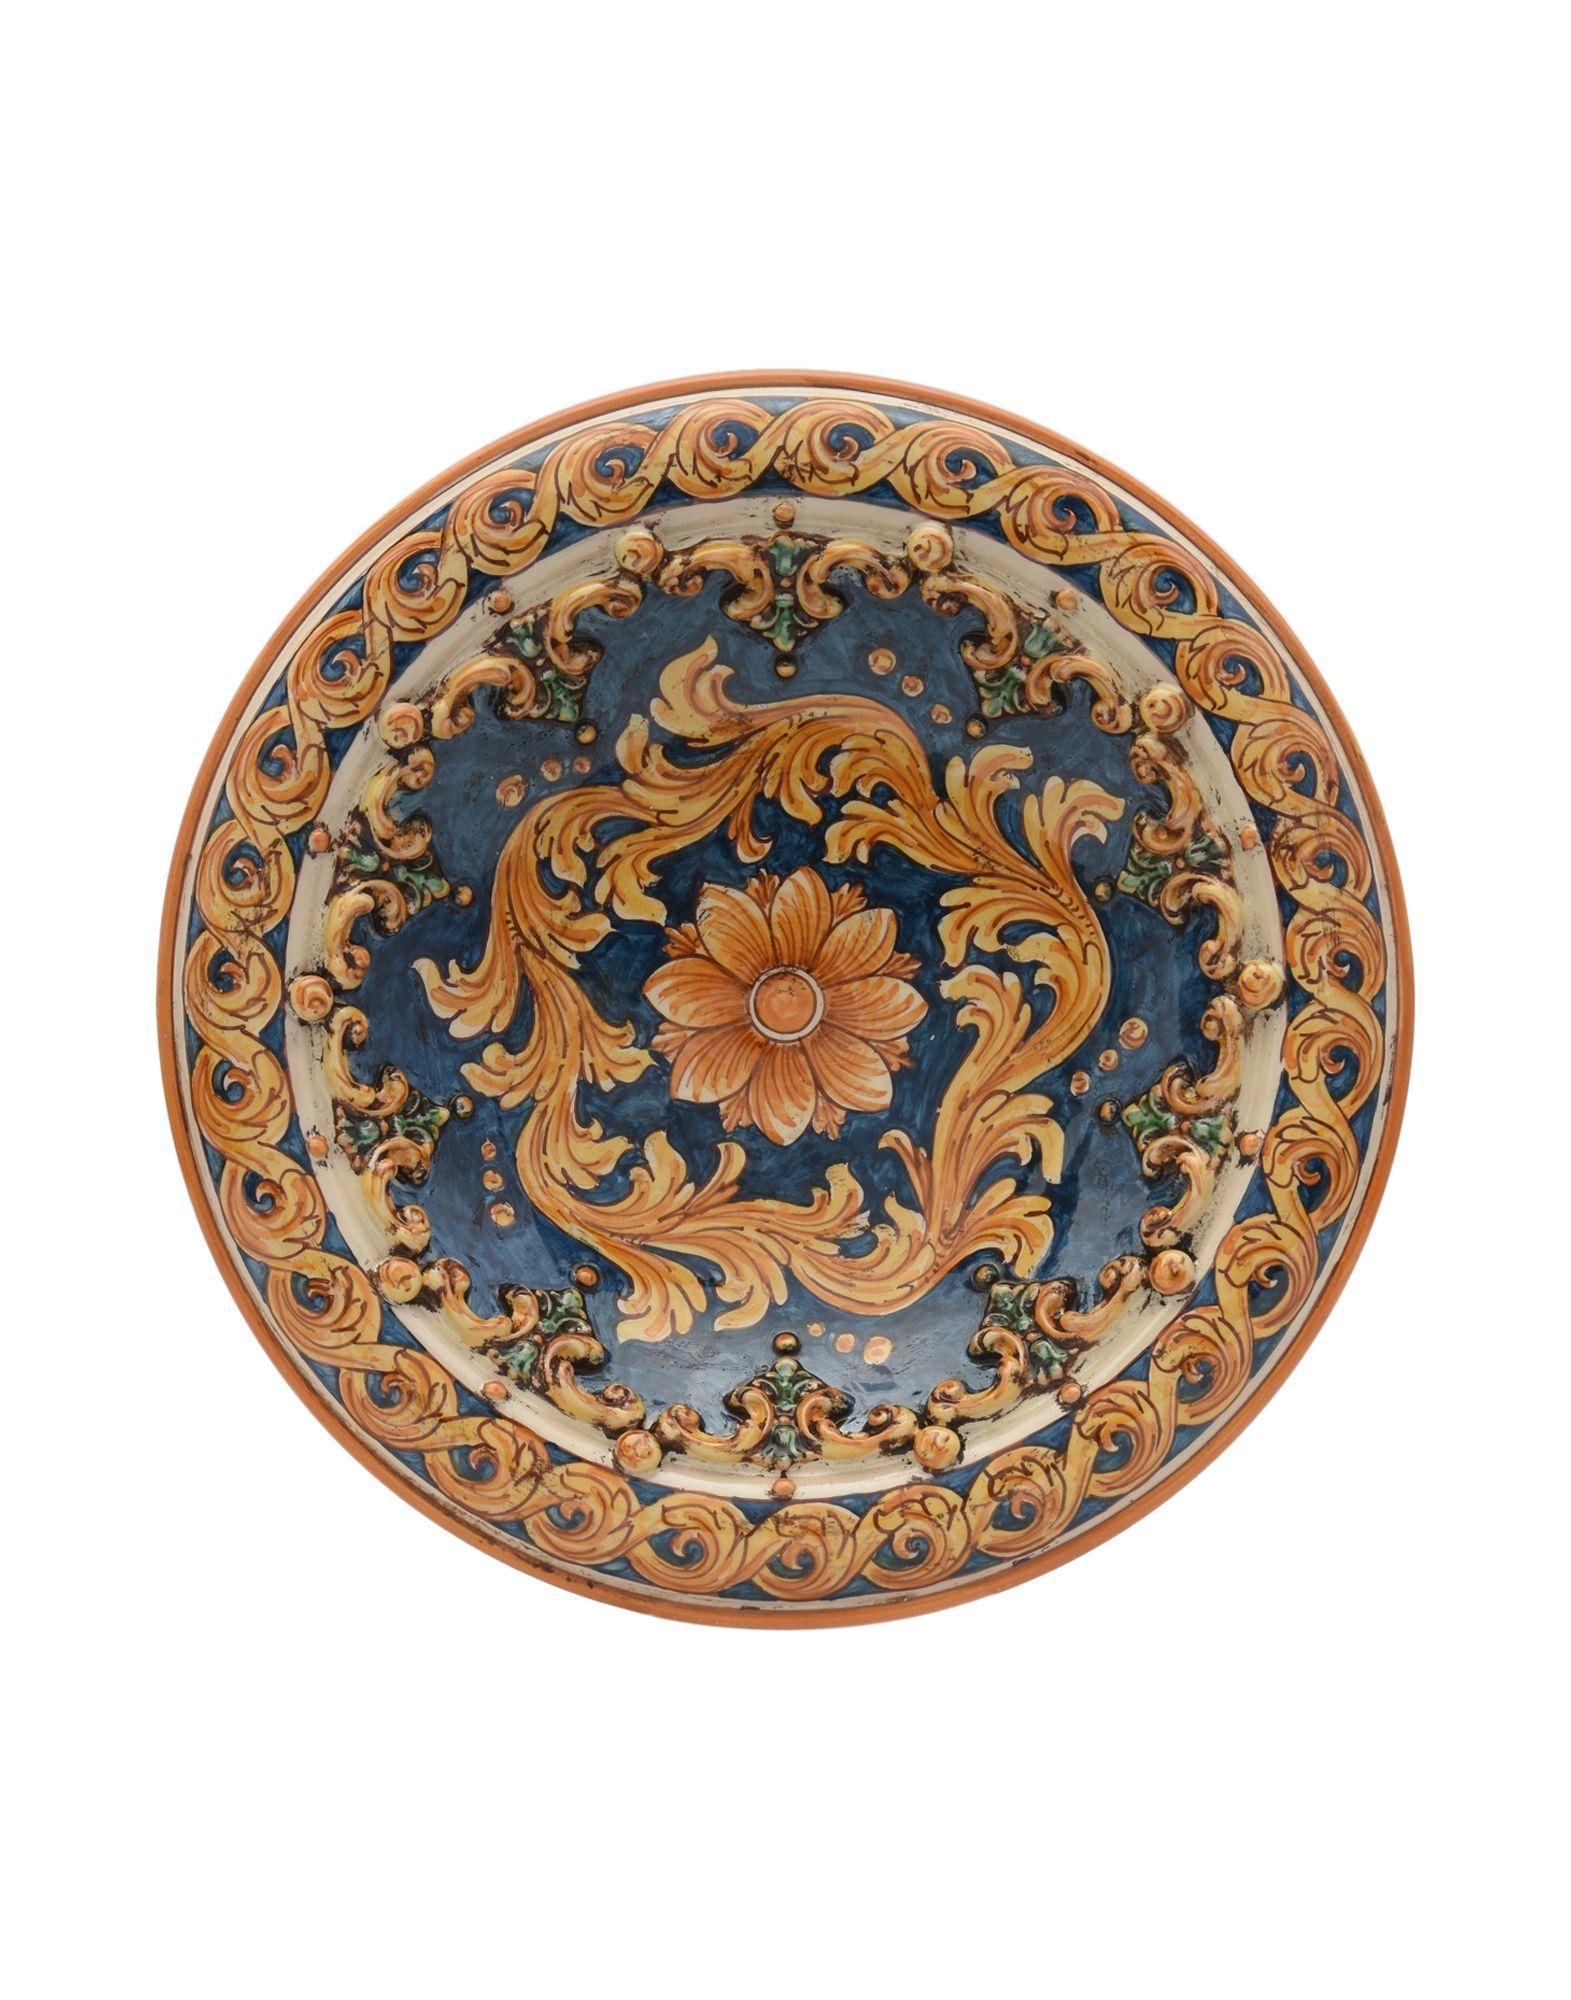 CERAMICHE SOFIA DI CALTAGIRONE Декоративная тарелка sofia zharova сине зимнее пальто ручной работы марки sofia zharova